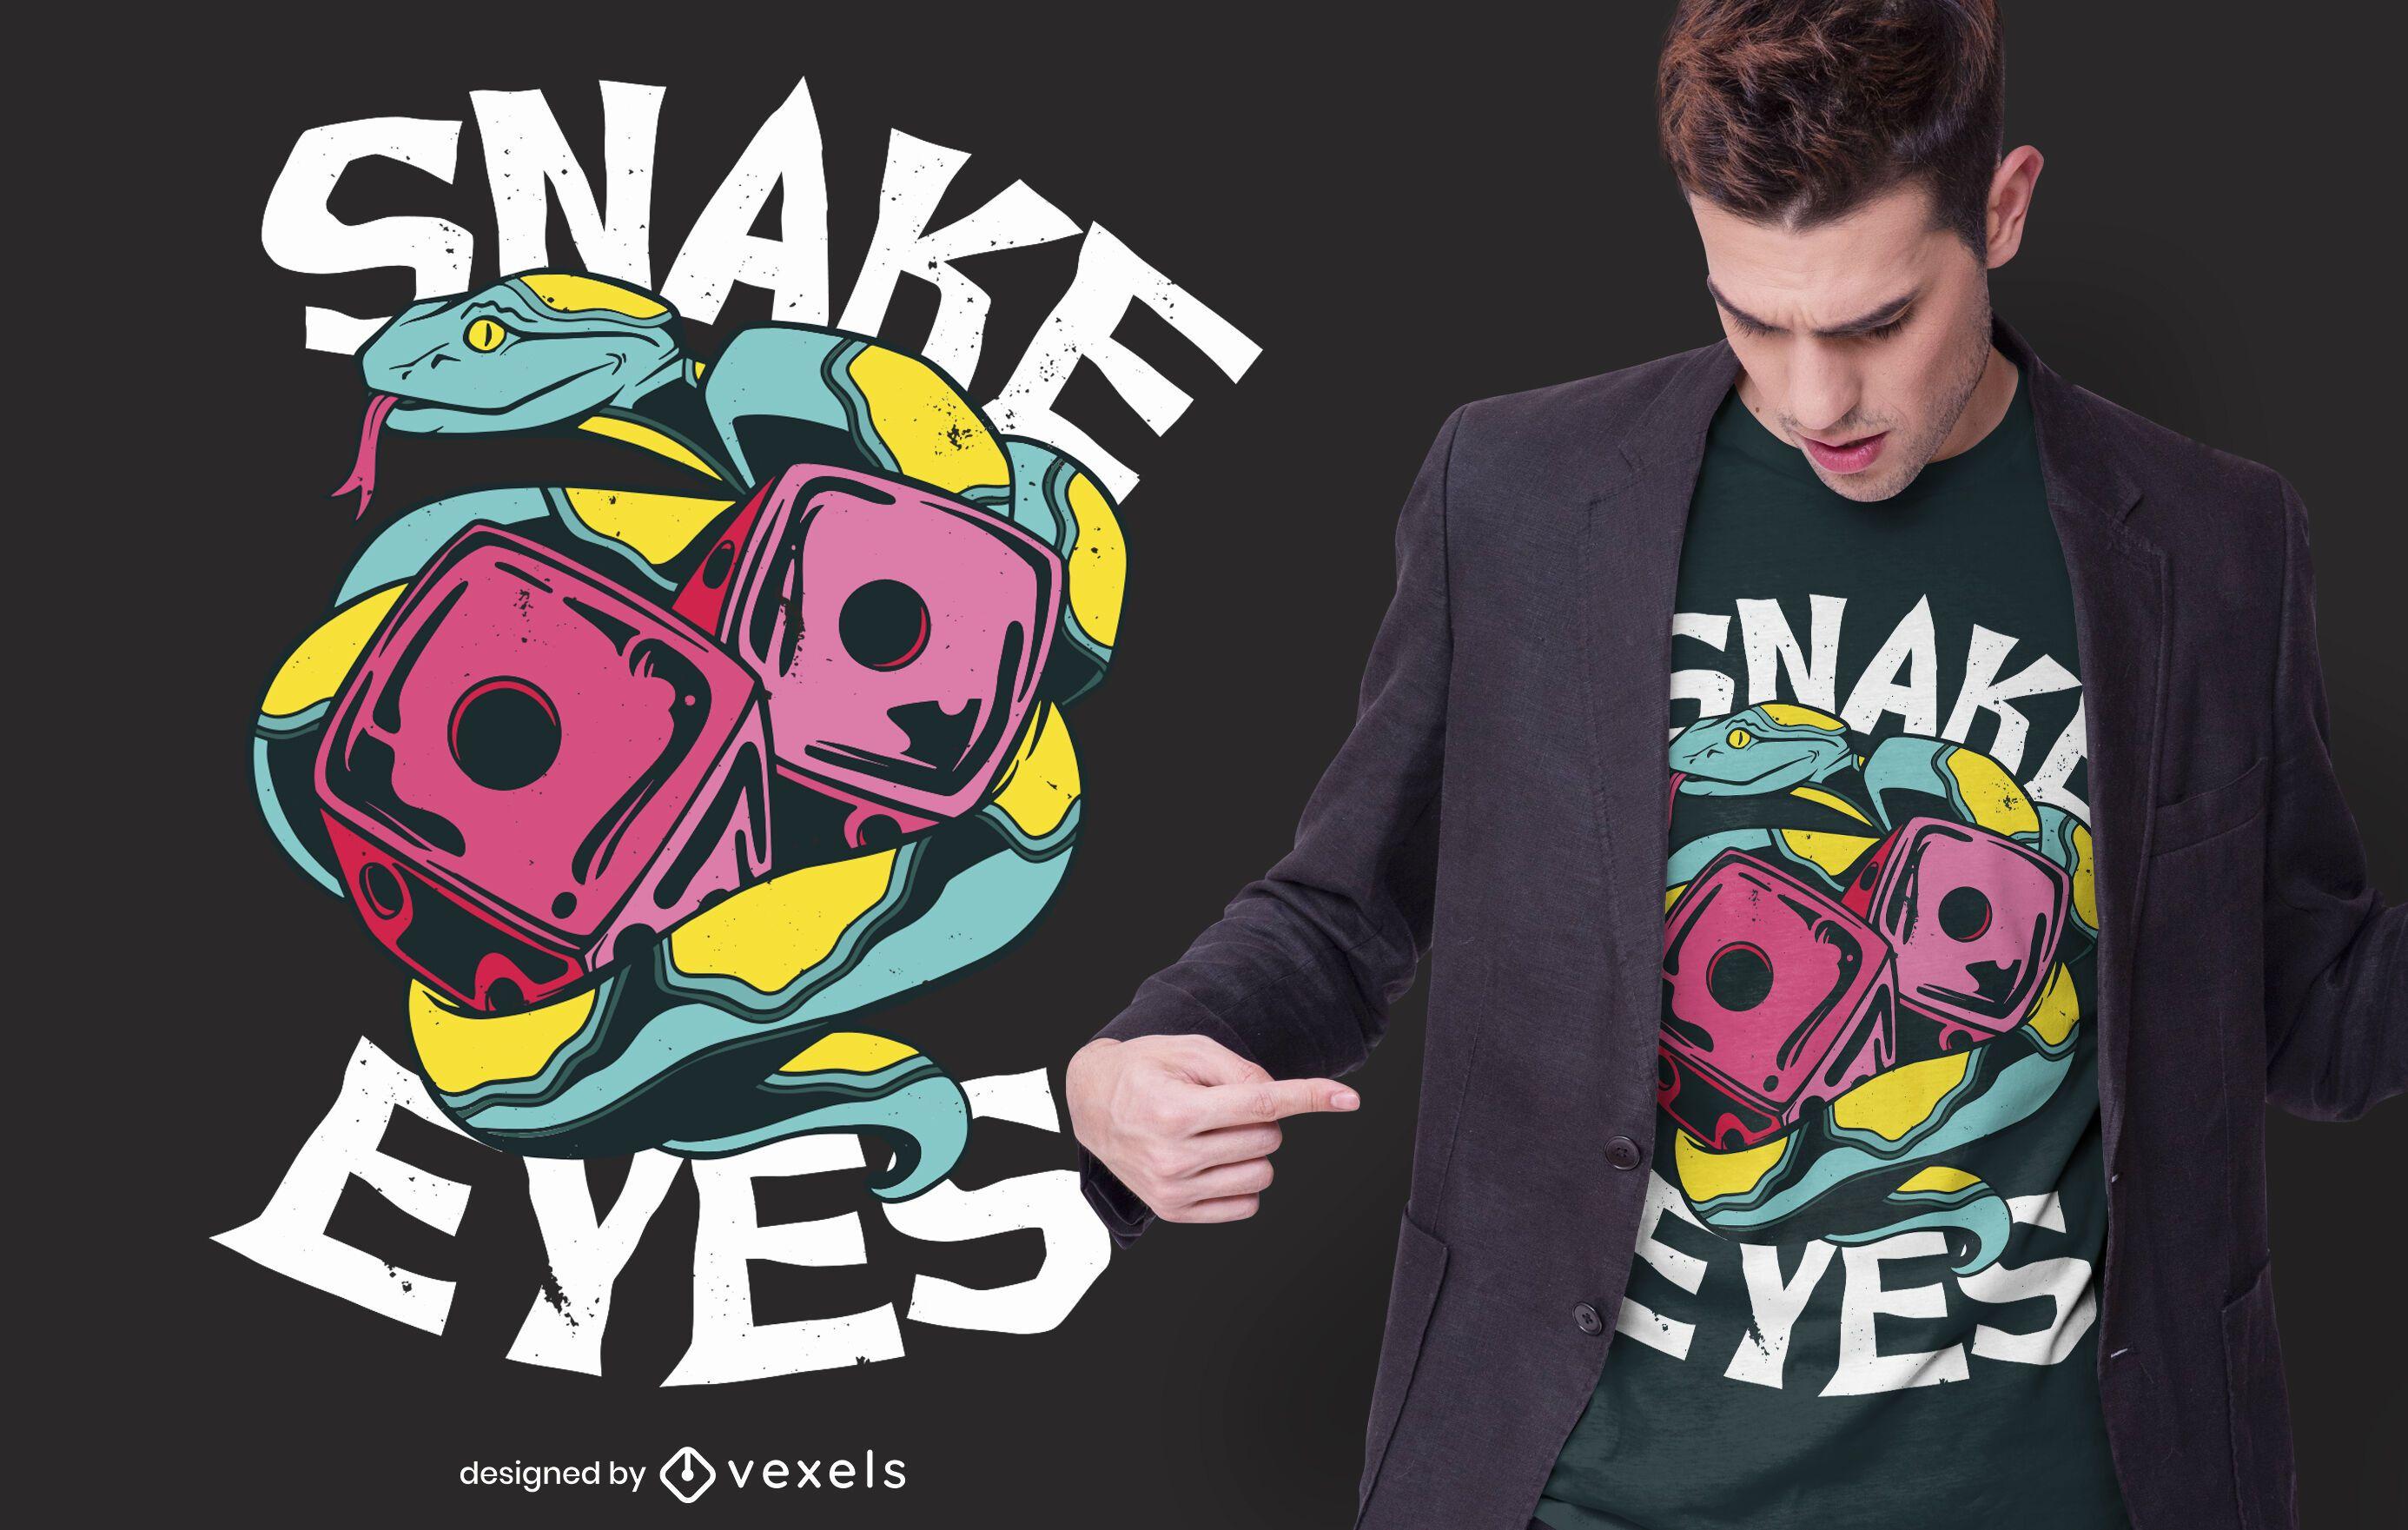 Snake eyes dice t-shirt design